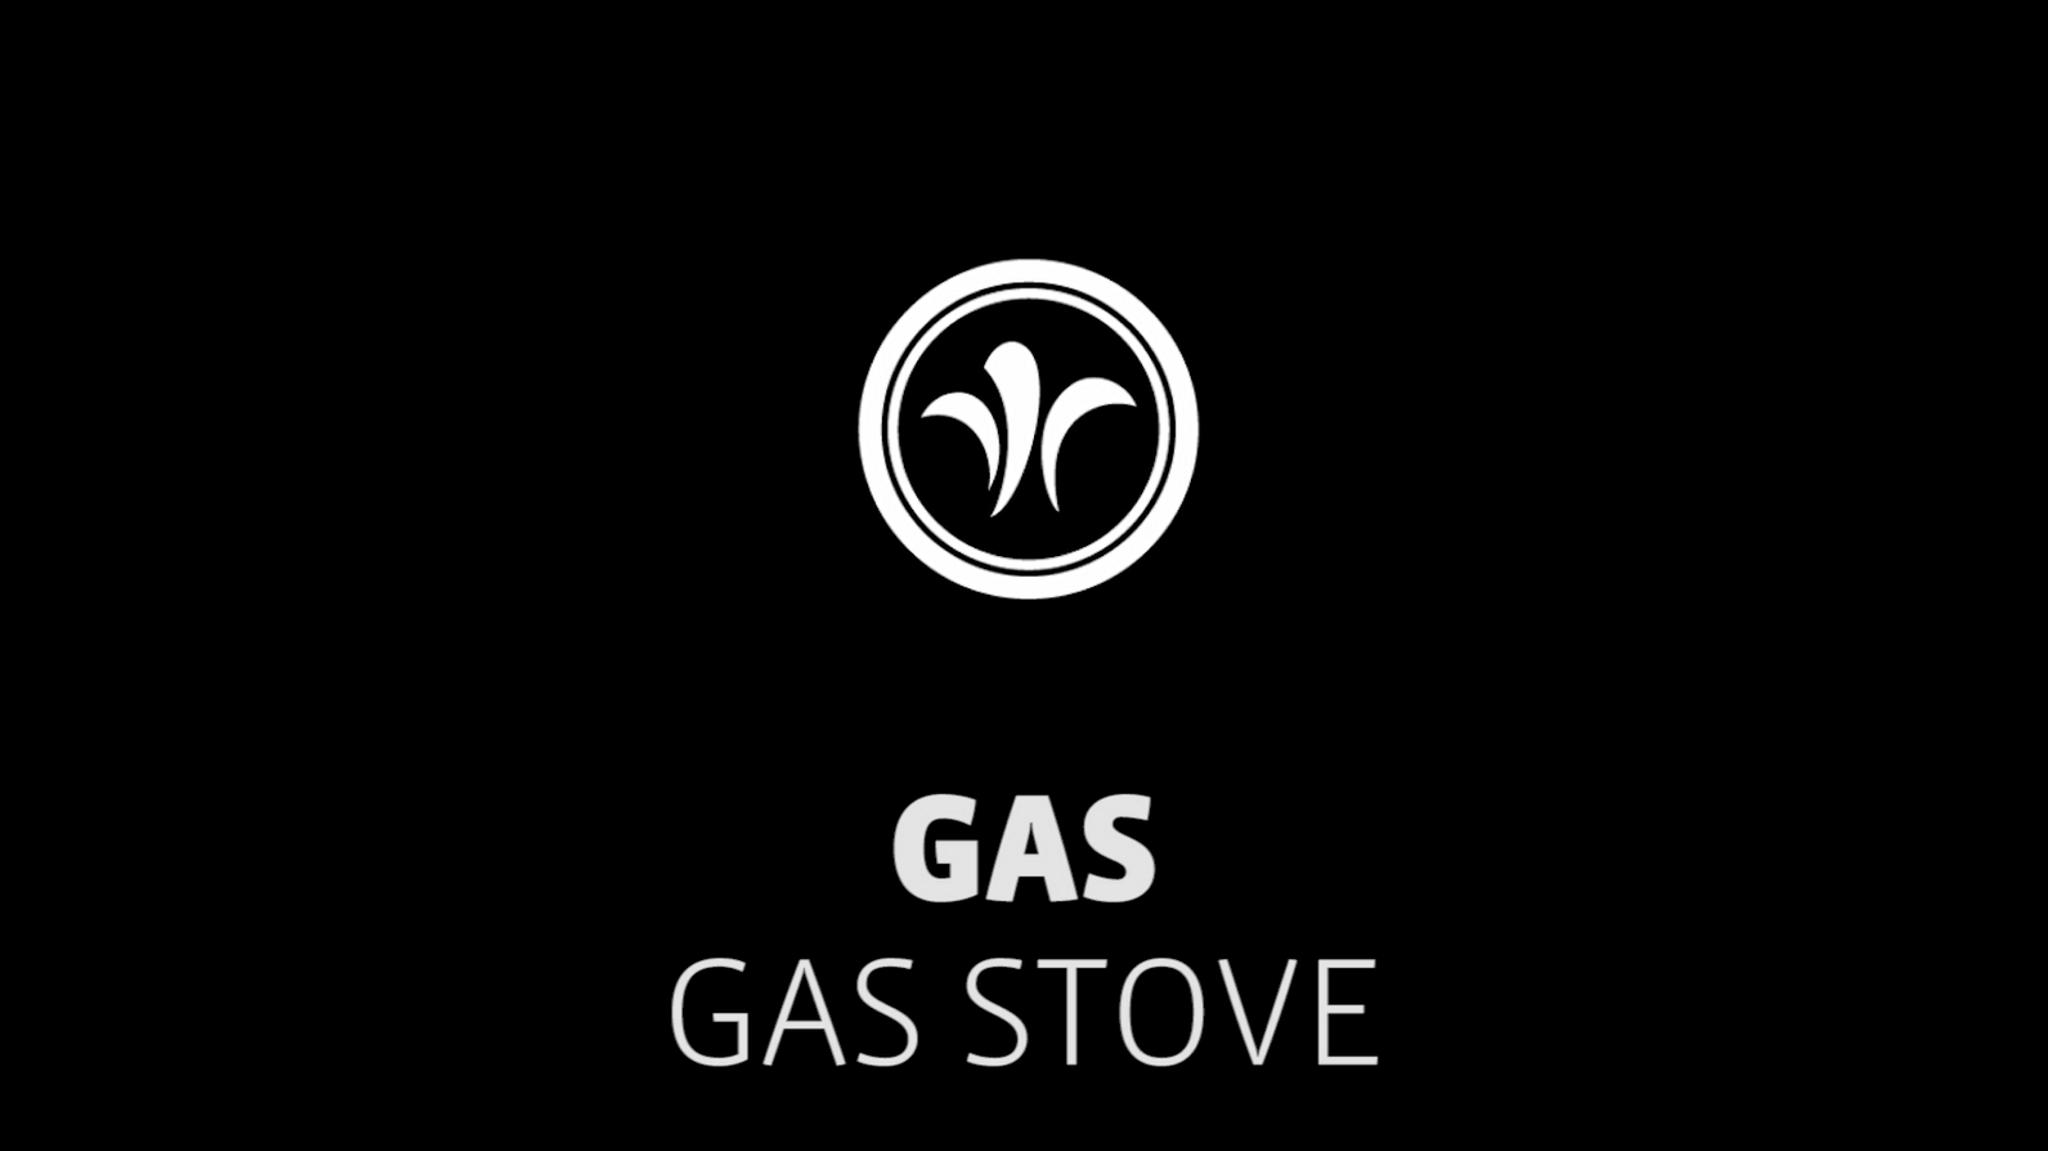 motorhome stove // niesmann+bischoff - camper (model ARTO) // 2019 // G3